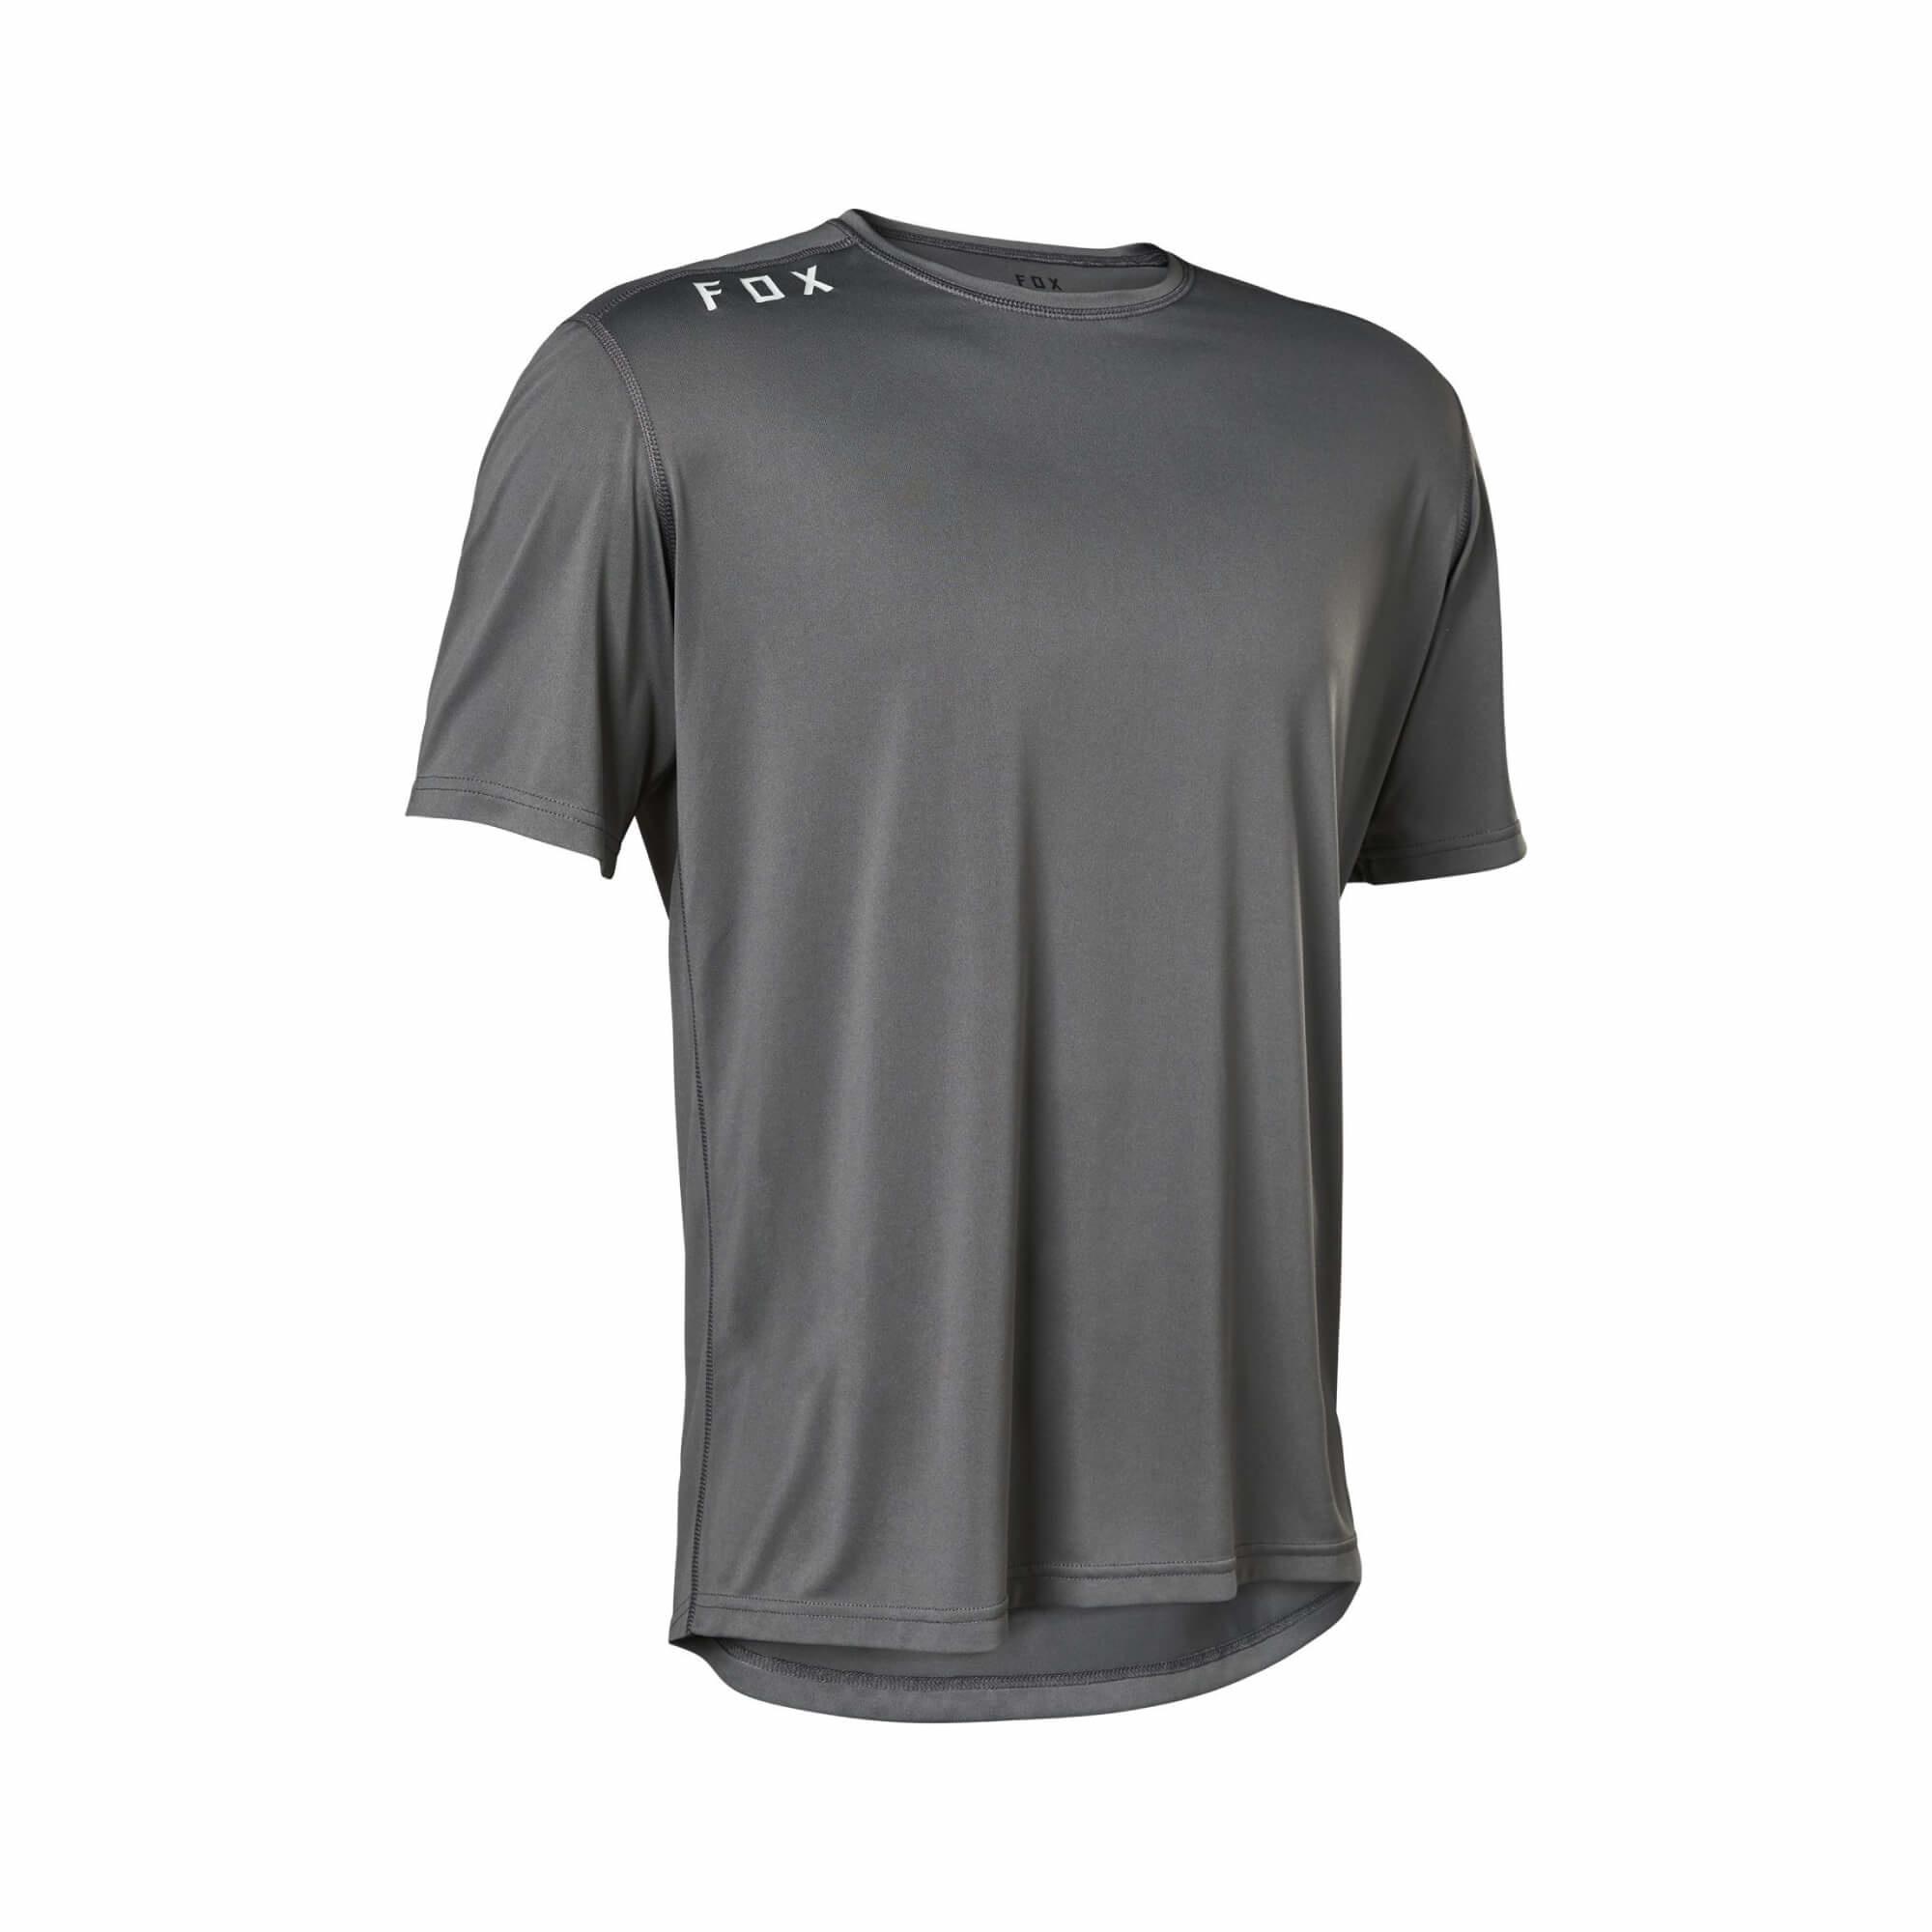 Ranger Short Sleeve Jersey Graphic 2 2021-1